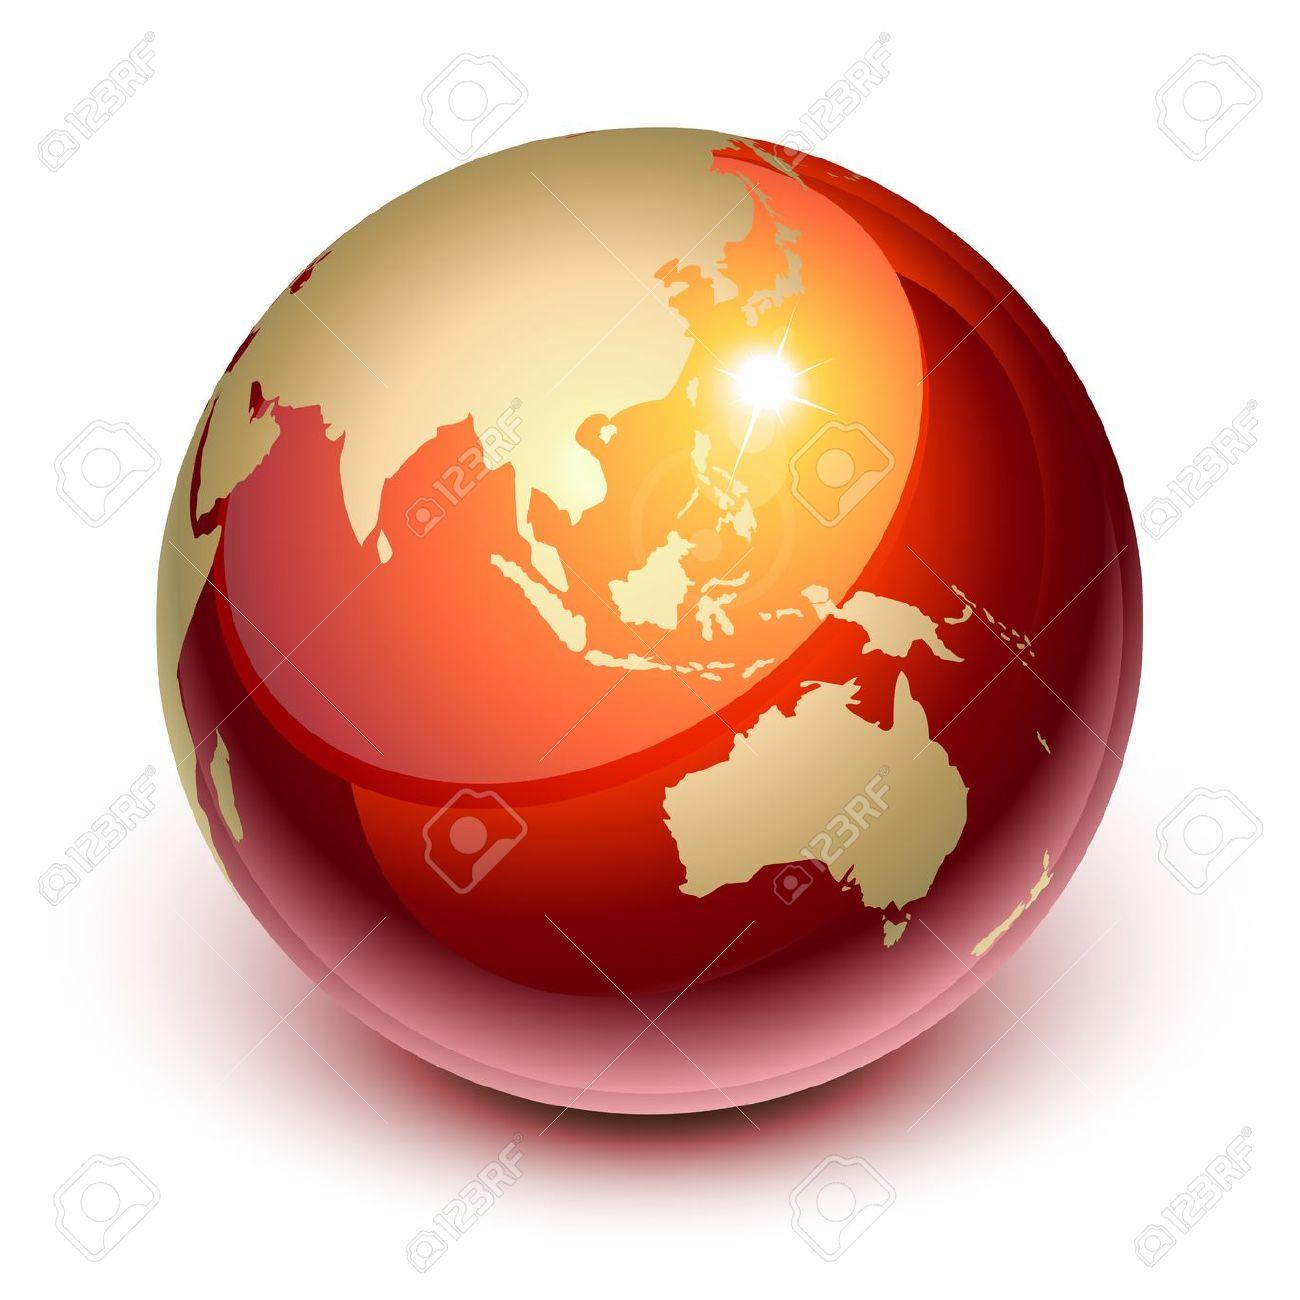 Terra Rossa Da Asia E Australia Clipart Royalty.